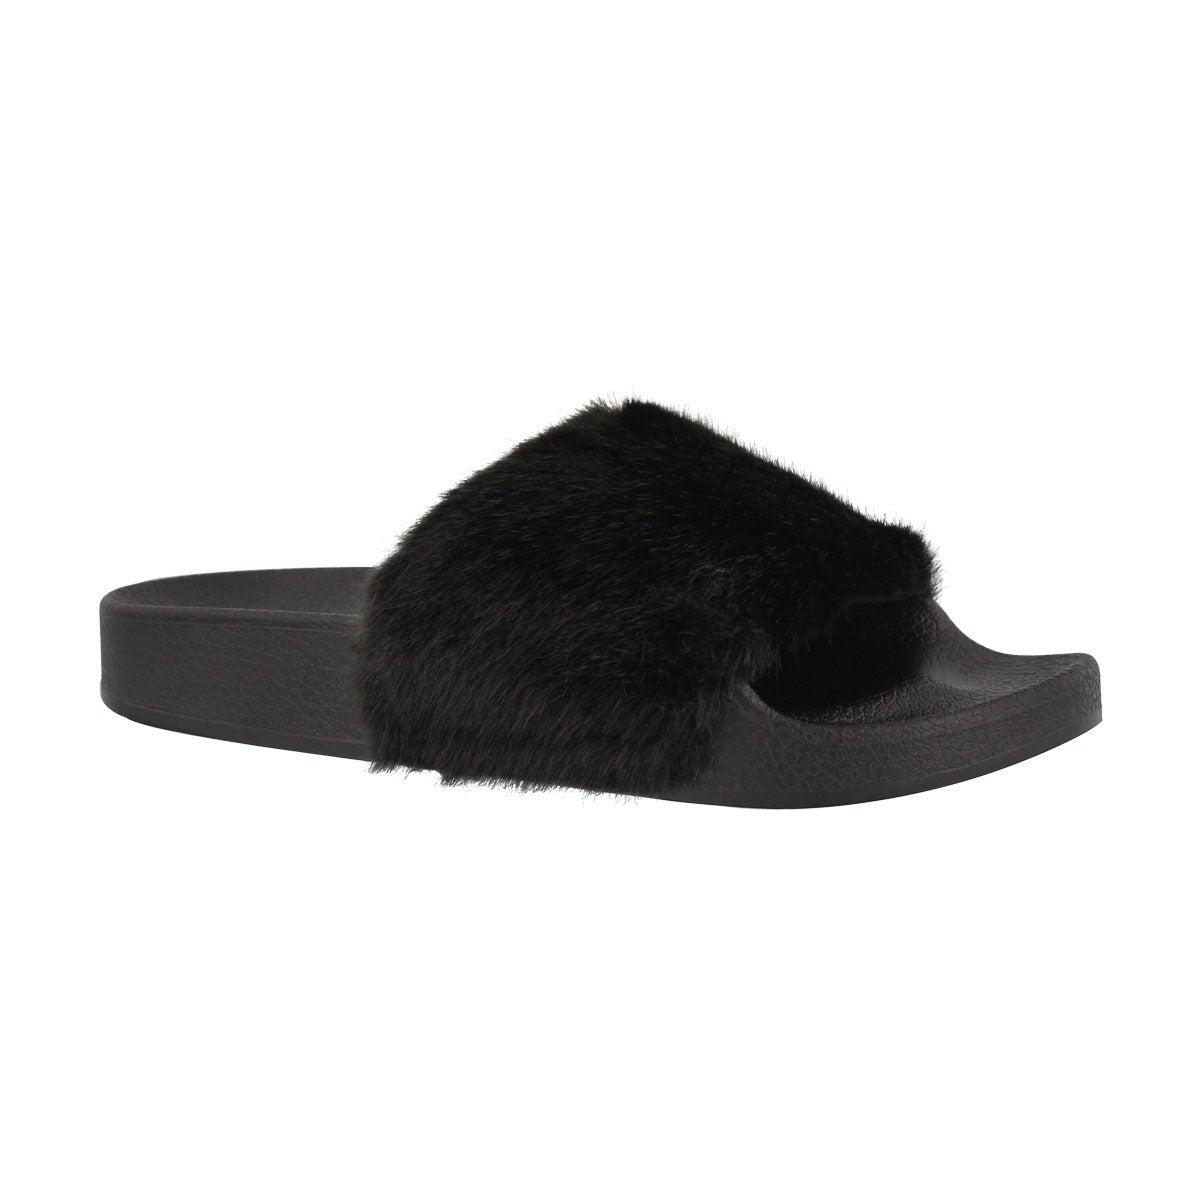 2613290abbf Girls' SOFTEY black fur slide sandals